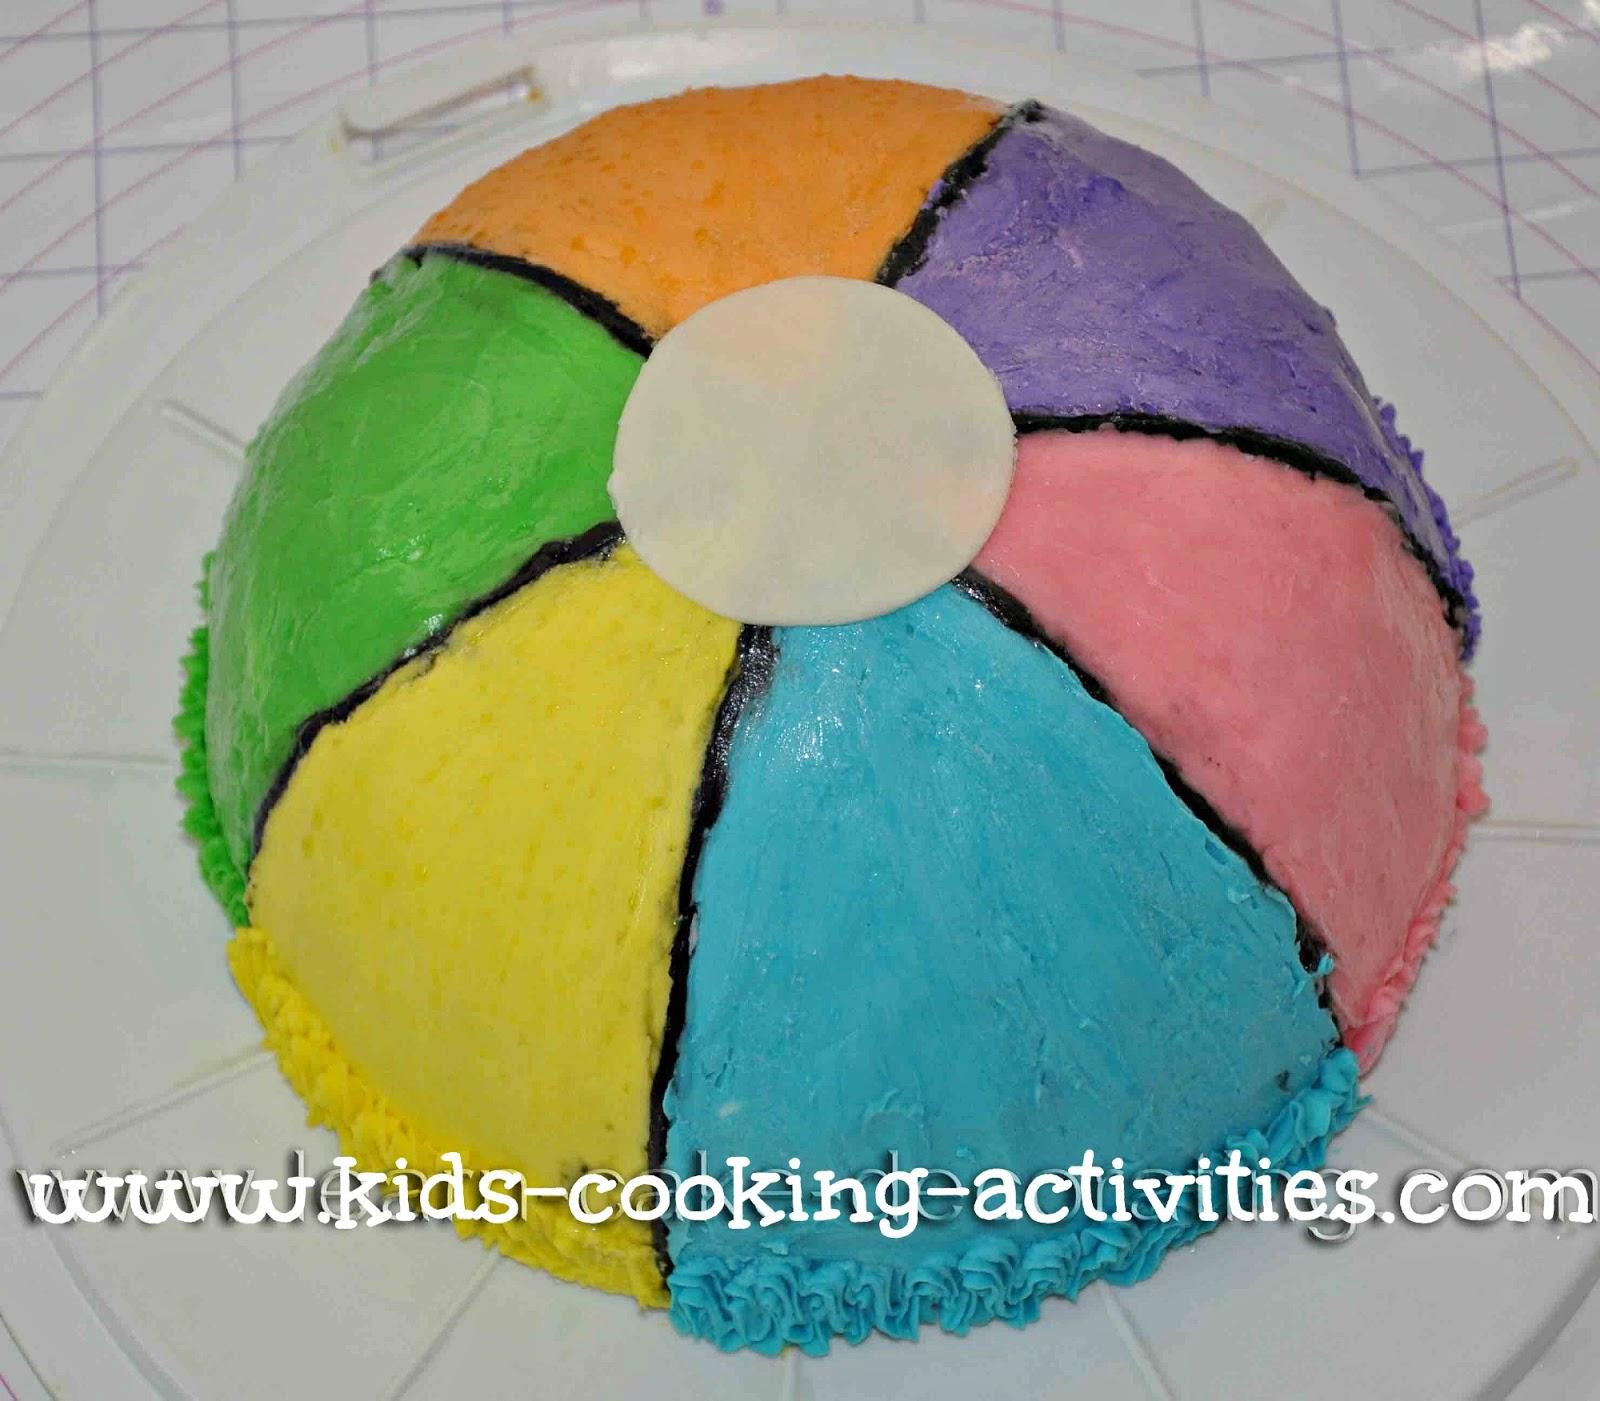 Kids Cooking Activities Fun Summer Cake Ideas for Kids